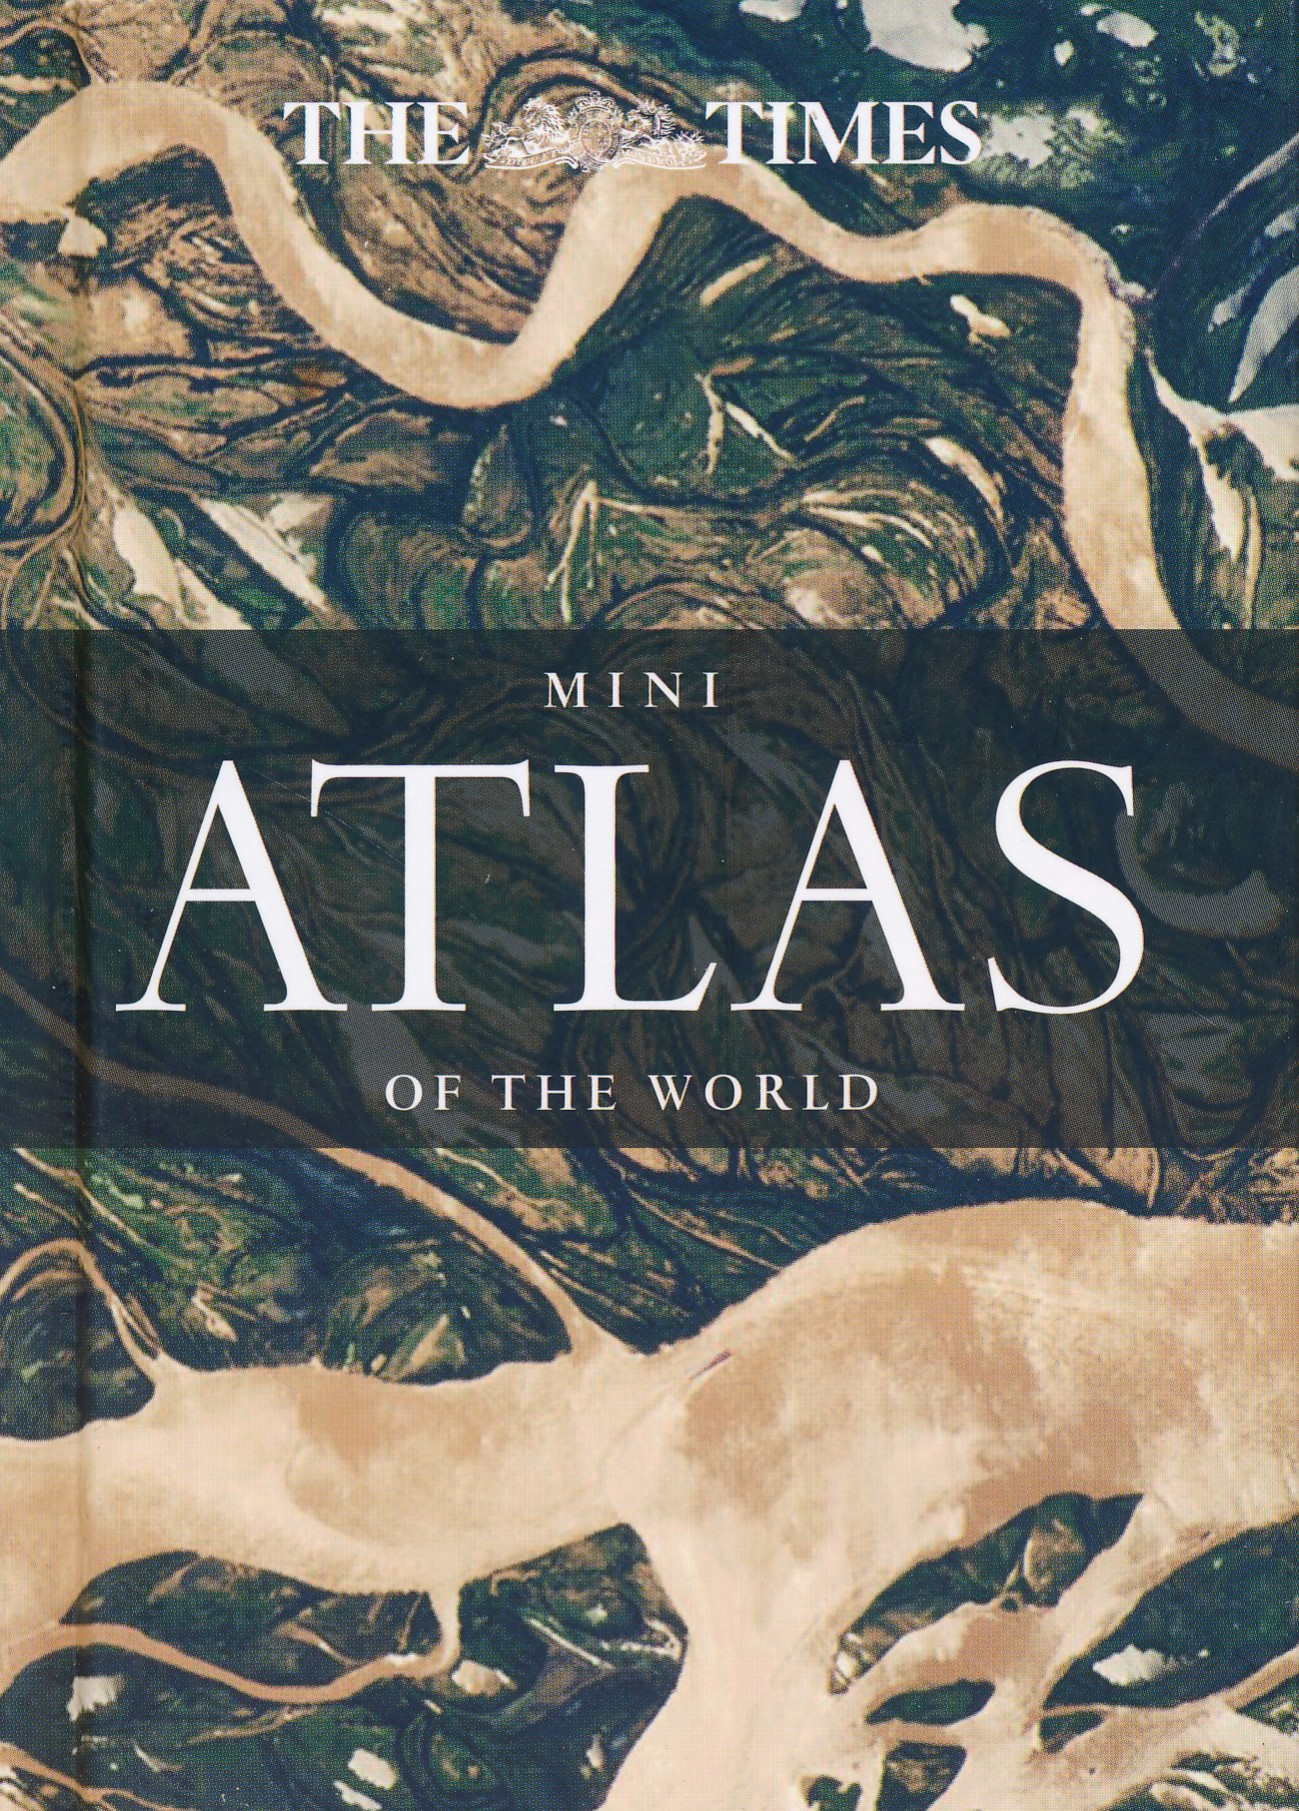 Opruiming - The Times Mini Atlas of the World   Collins de zwerver